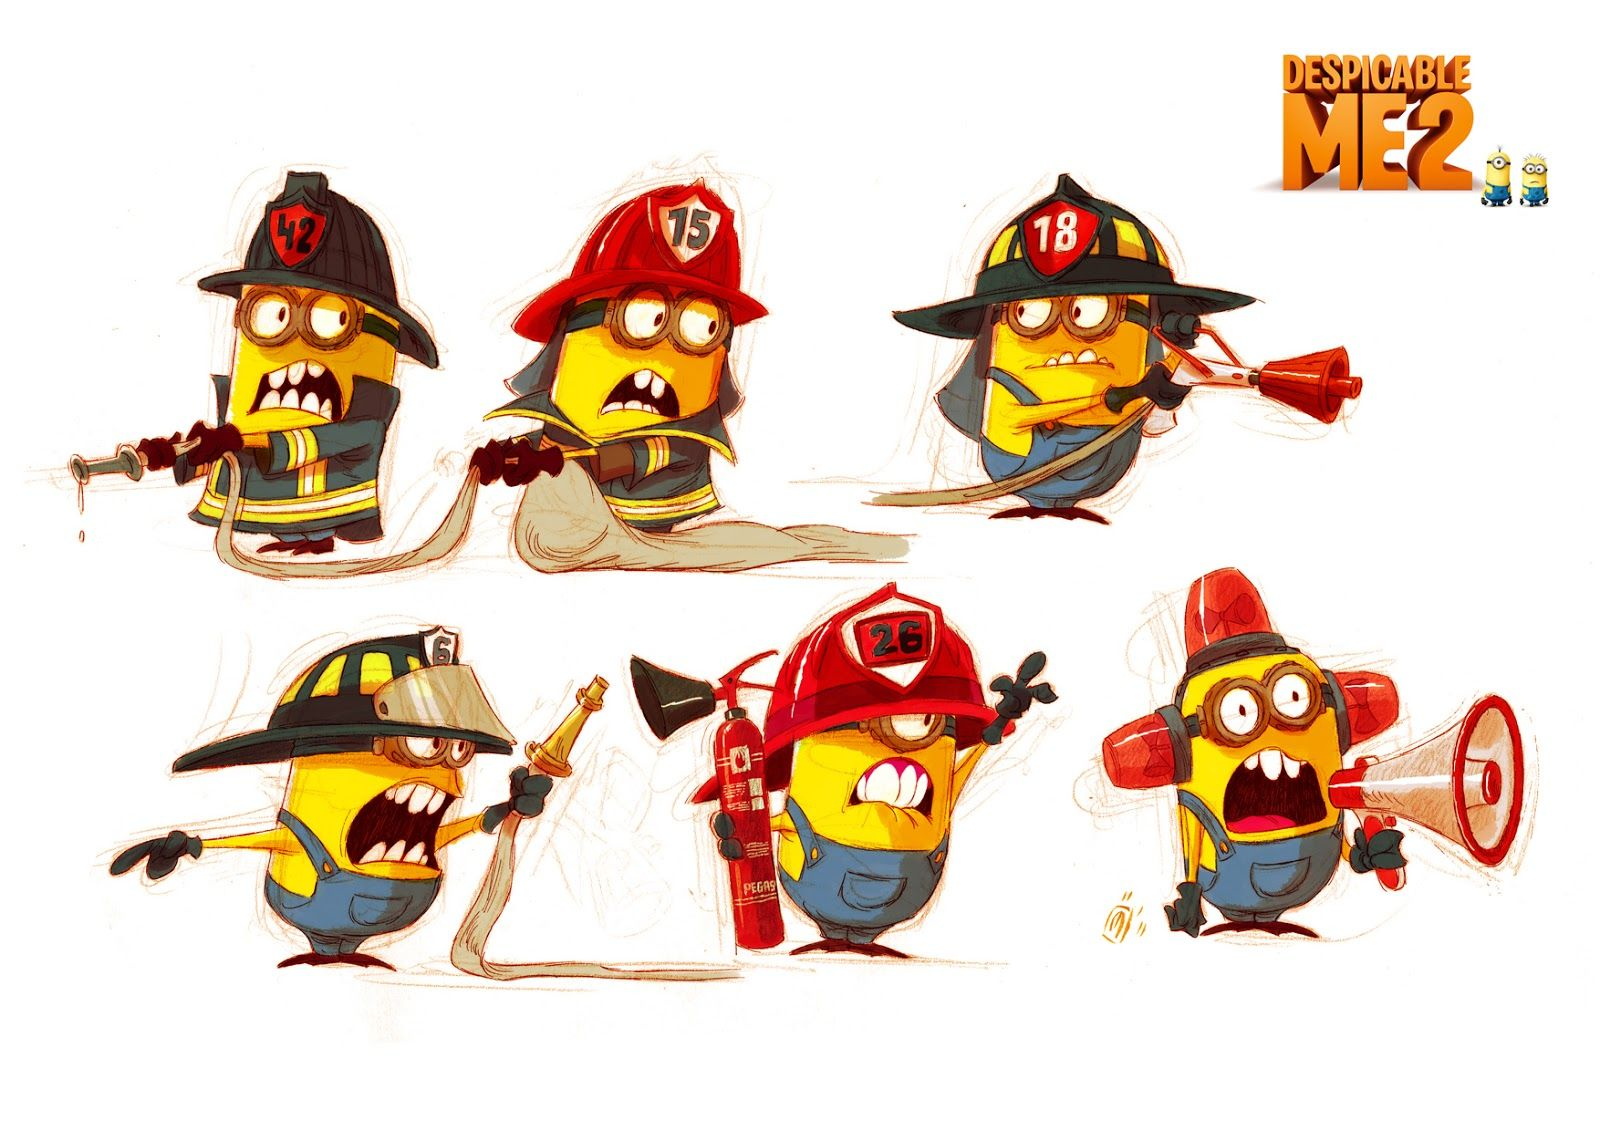 Despicable me 2 minion character studies so cute by - Minion pompier ...